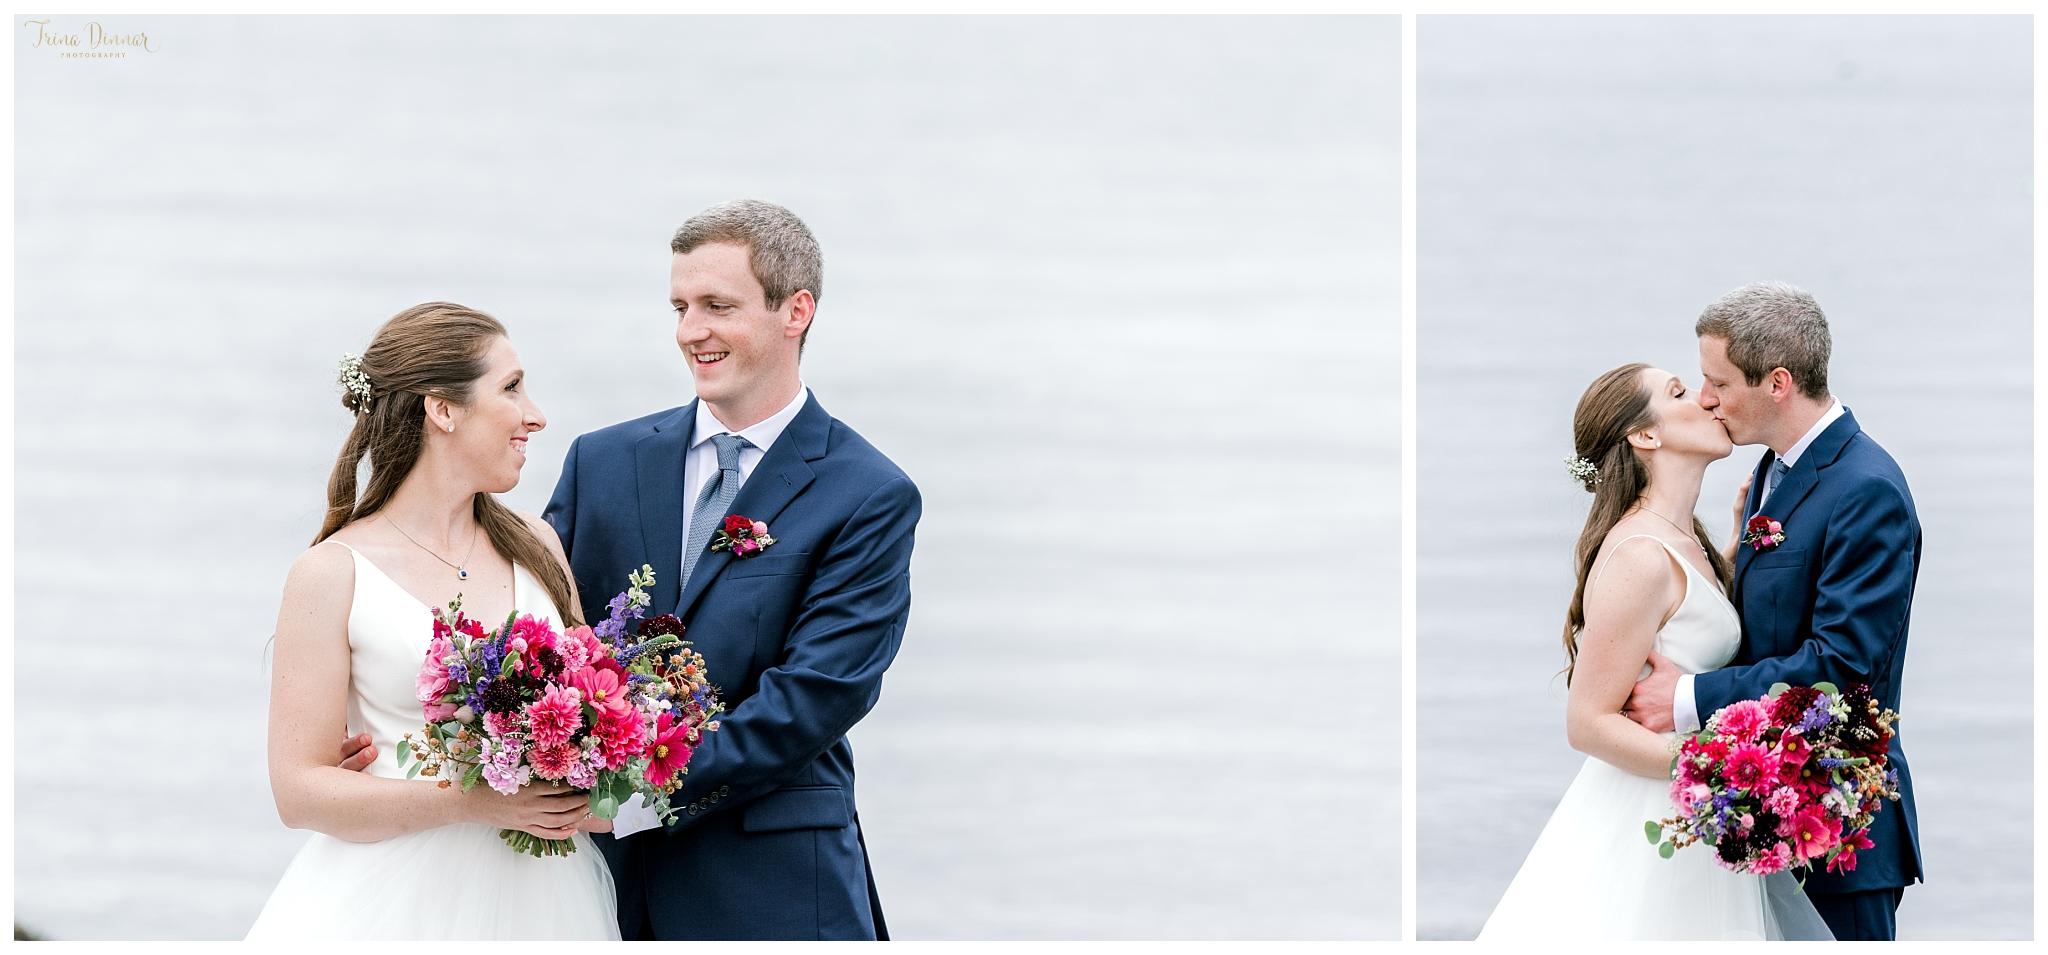 Wedding Photographer Captures Coastal Maine Portraits